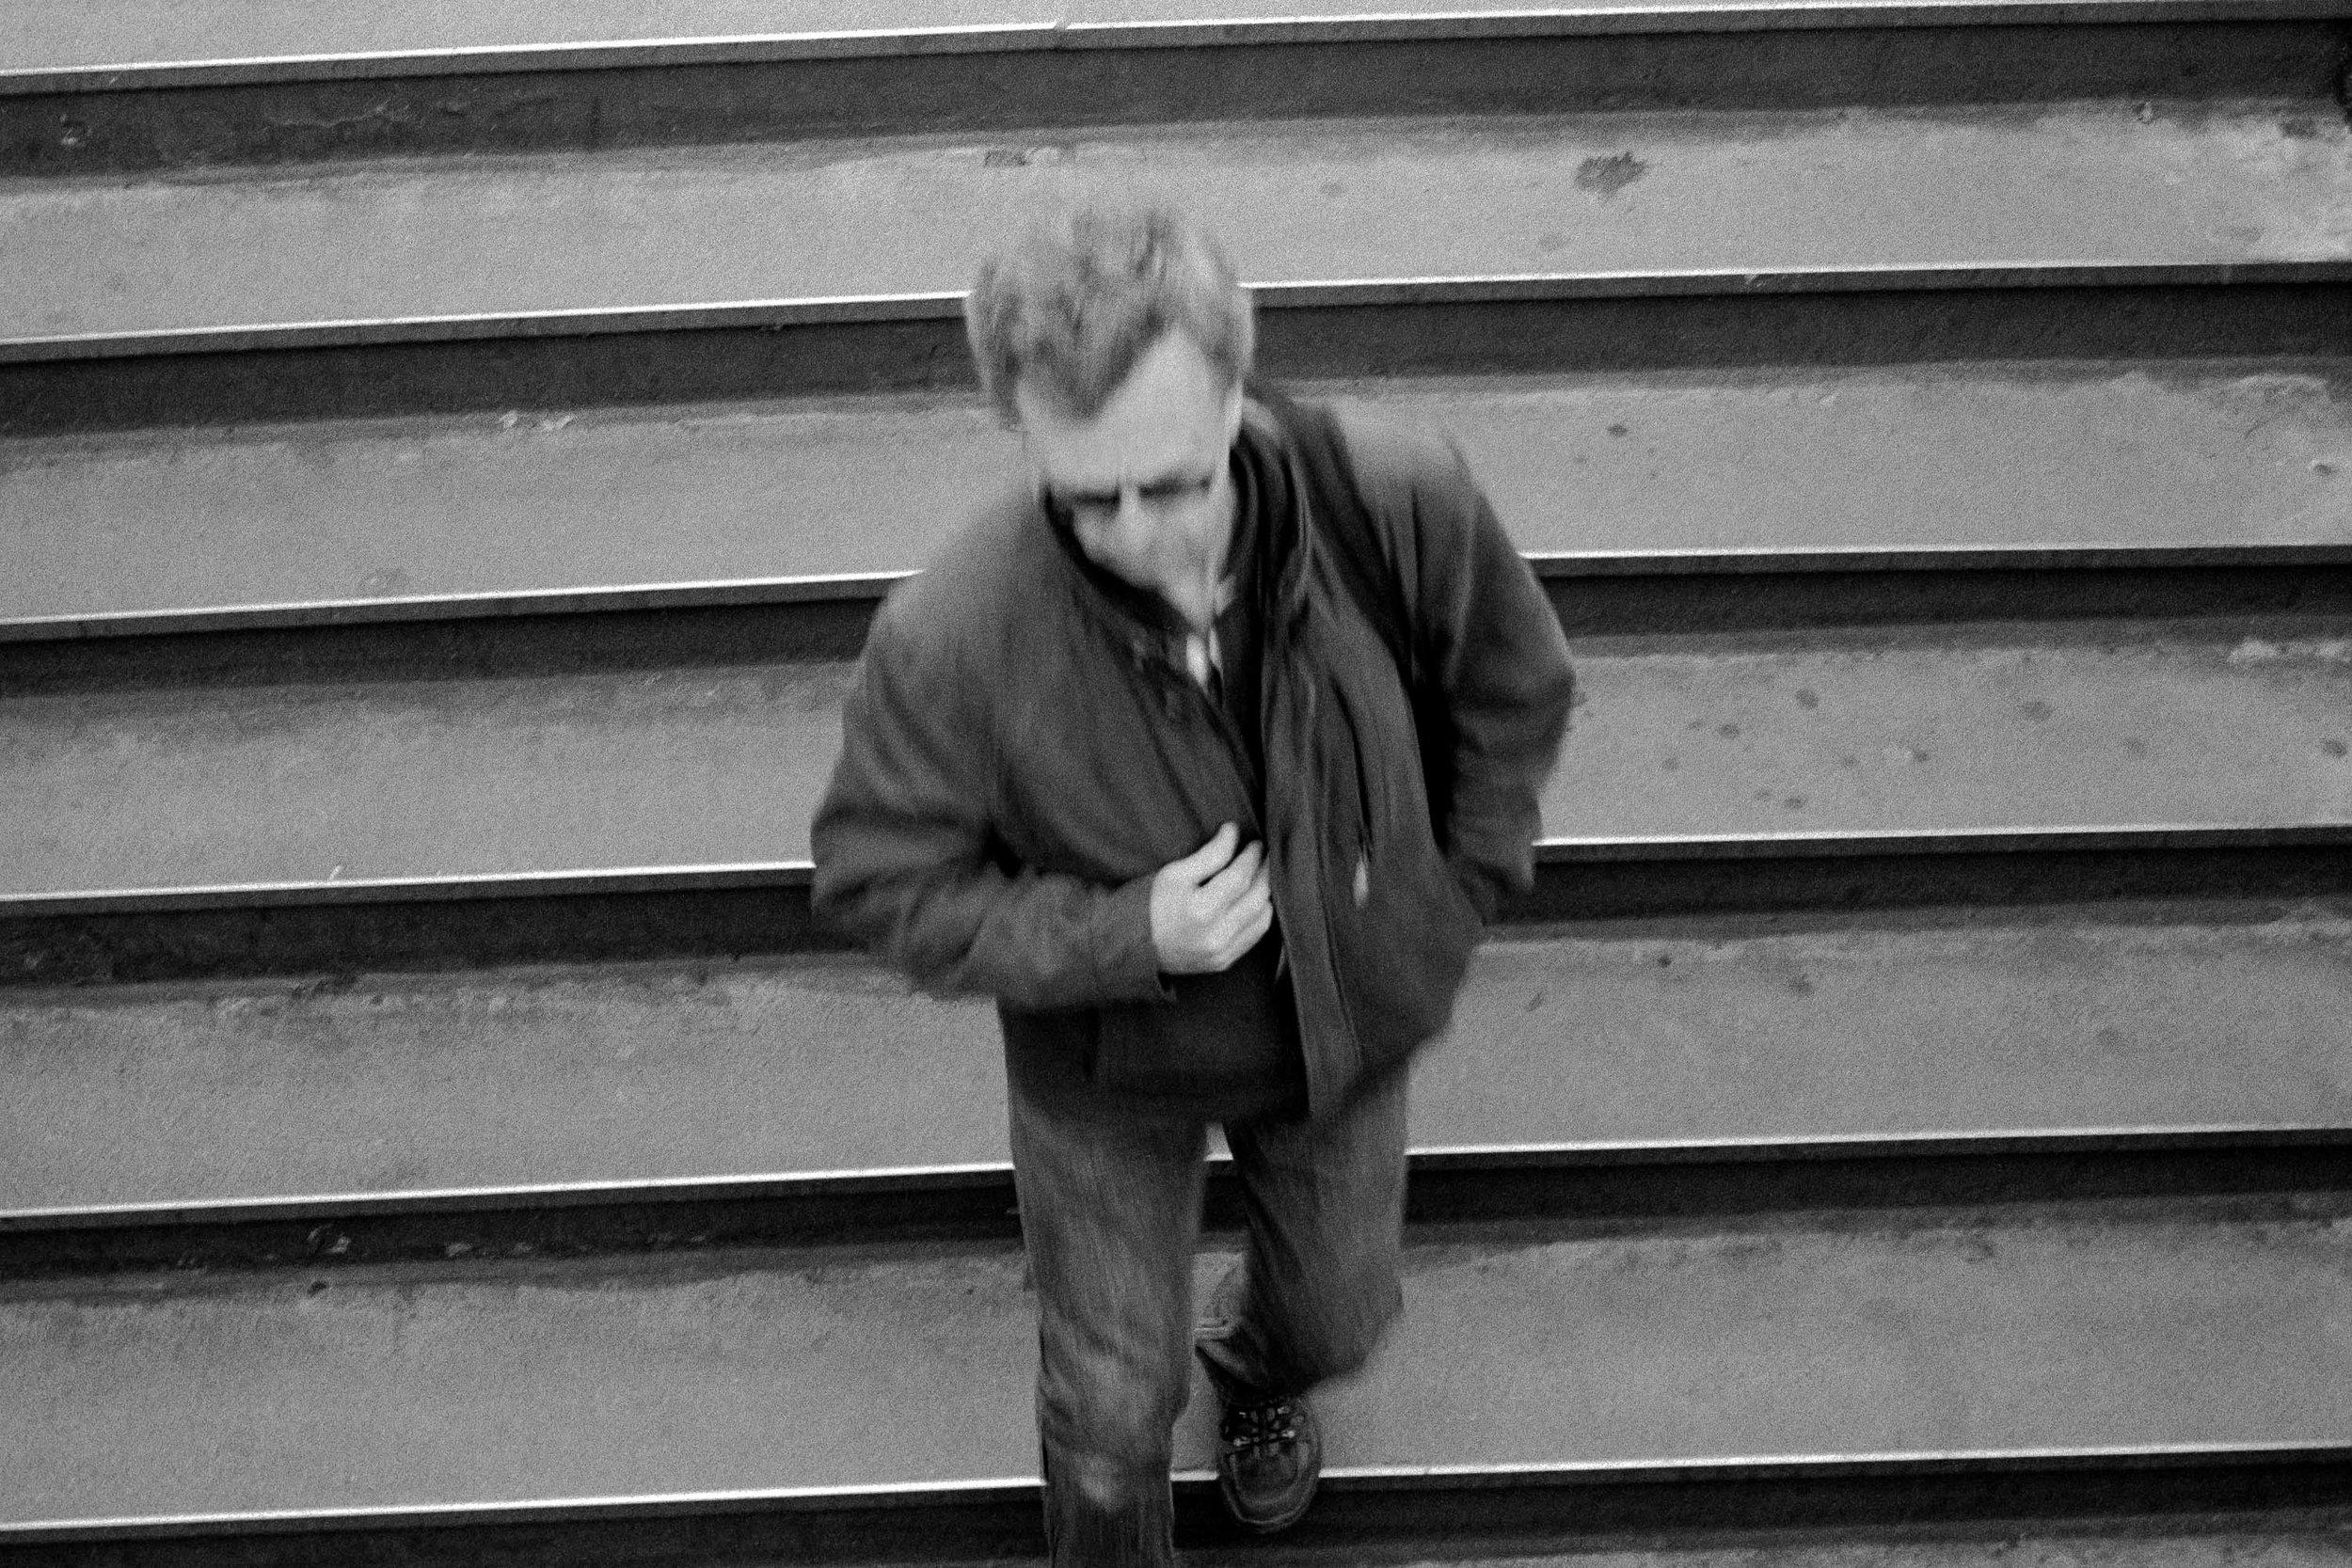 Mitchell Sturm - France 19.04.19-85.jpg